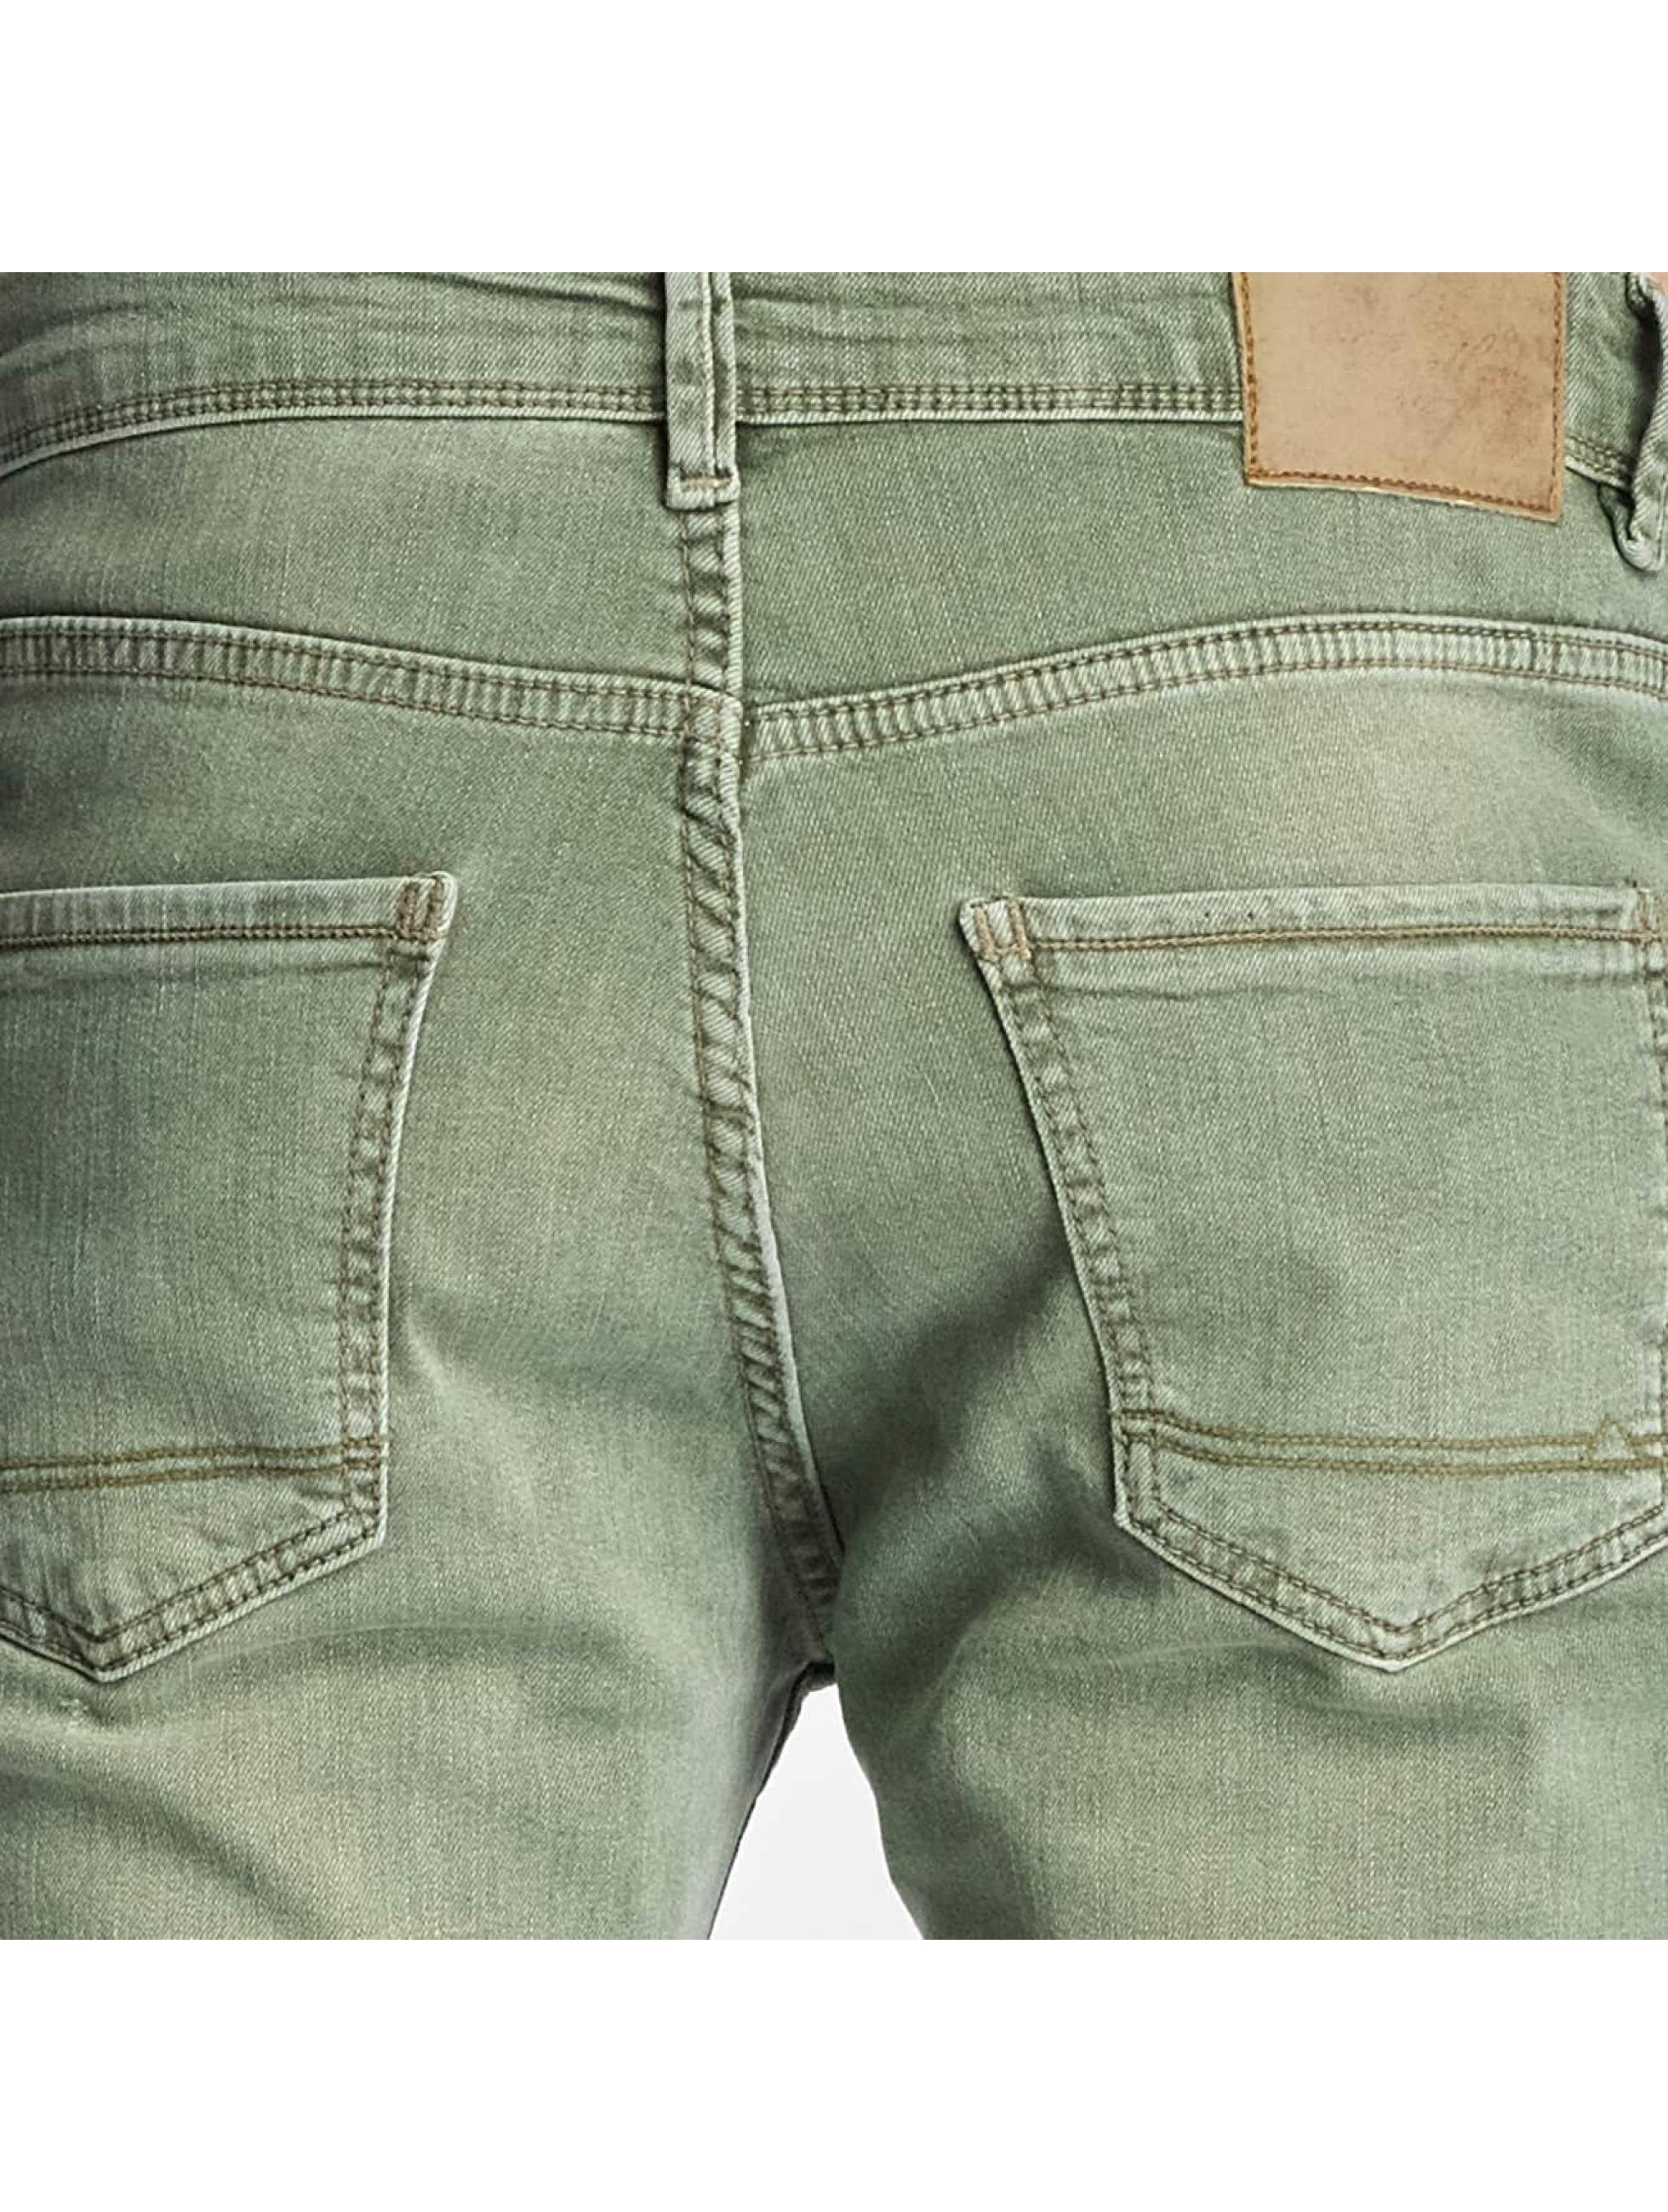 Reell Jeans Slim Fit Jeans Spider olivová